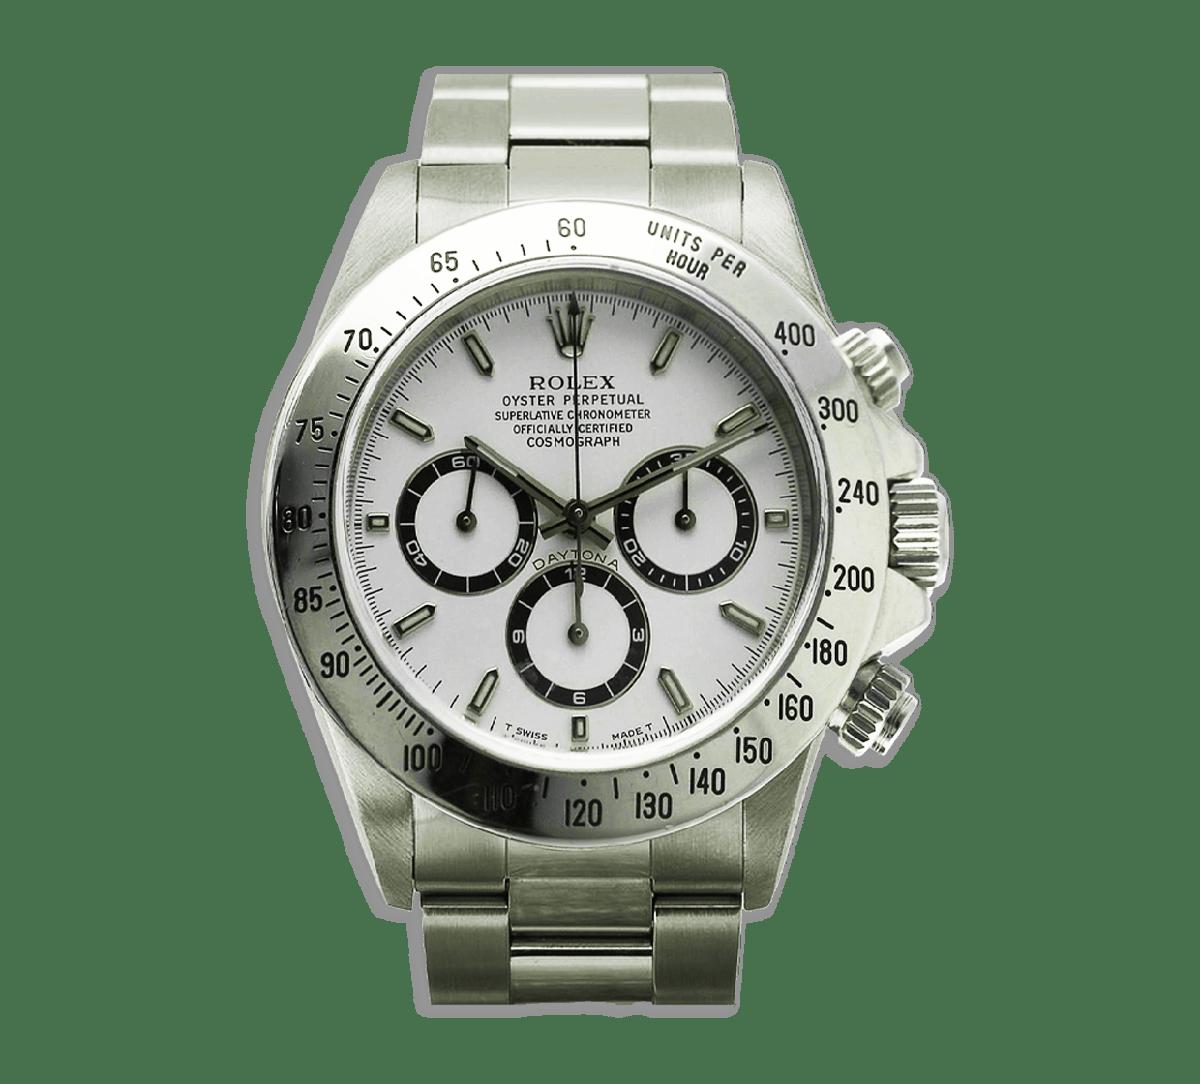 Rolex Daytona Zenith Image